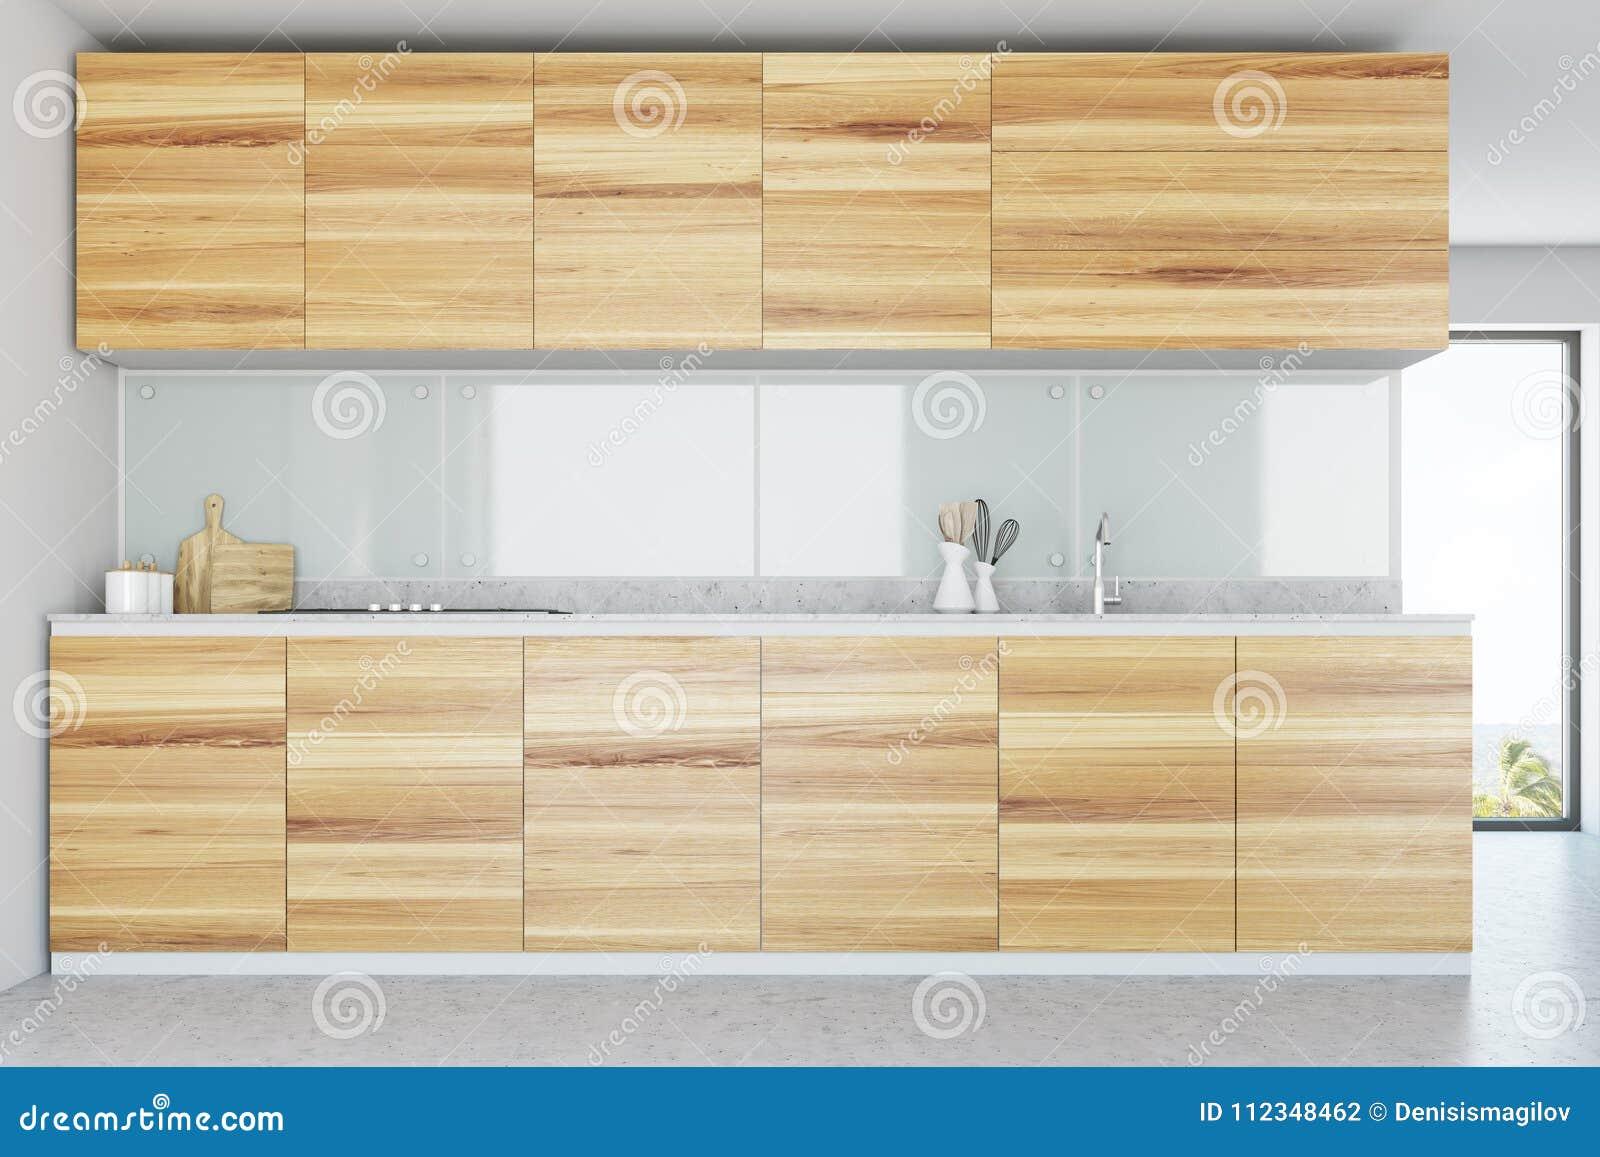 White Kitchen Interior, Wooden Counters Stock Illustration ...